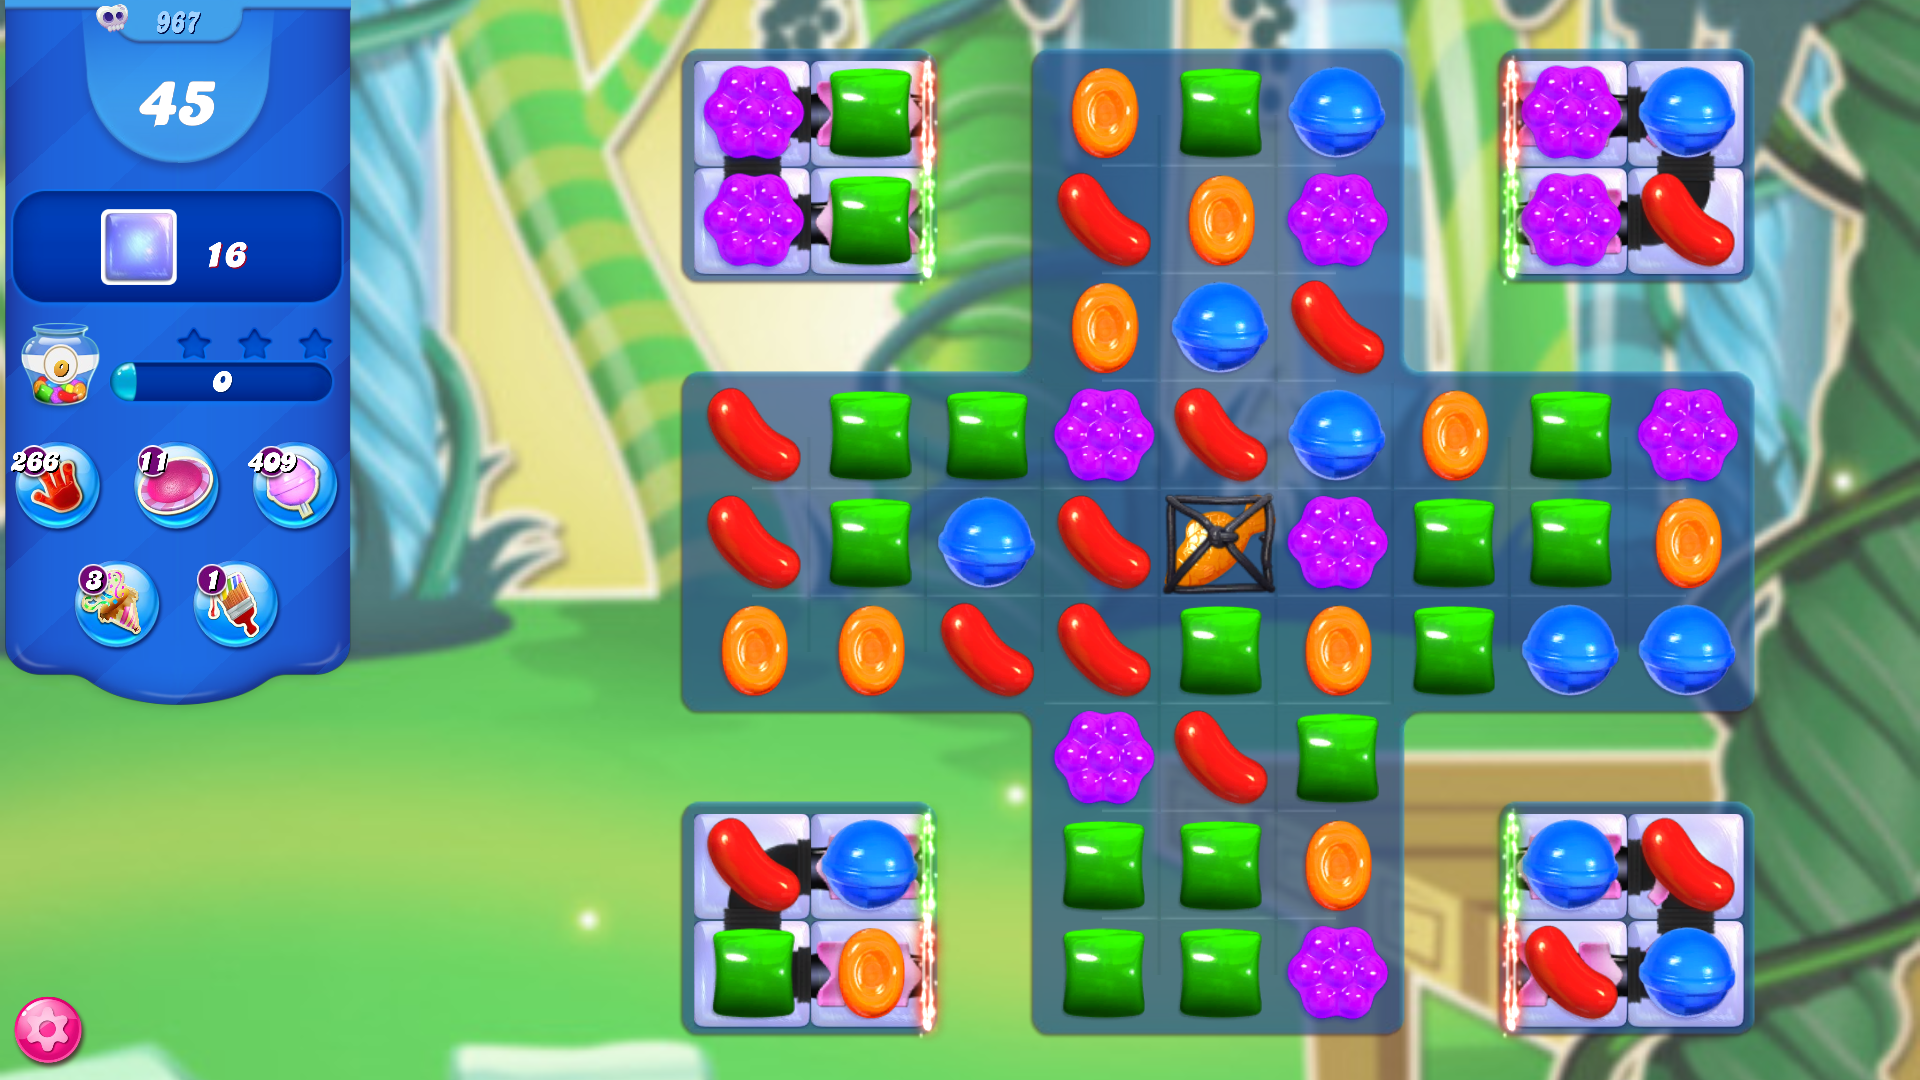 Candy Crush Saga Level 500 Please see my new video without booster, http://youtu.be/GCslqm8QLaI Candy Crush Saga Walkthrough playlist: http://goo.gl/mY6TT Fa...